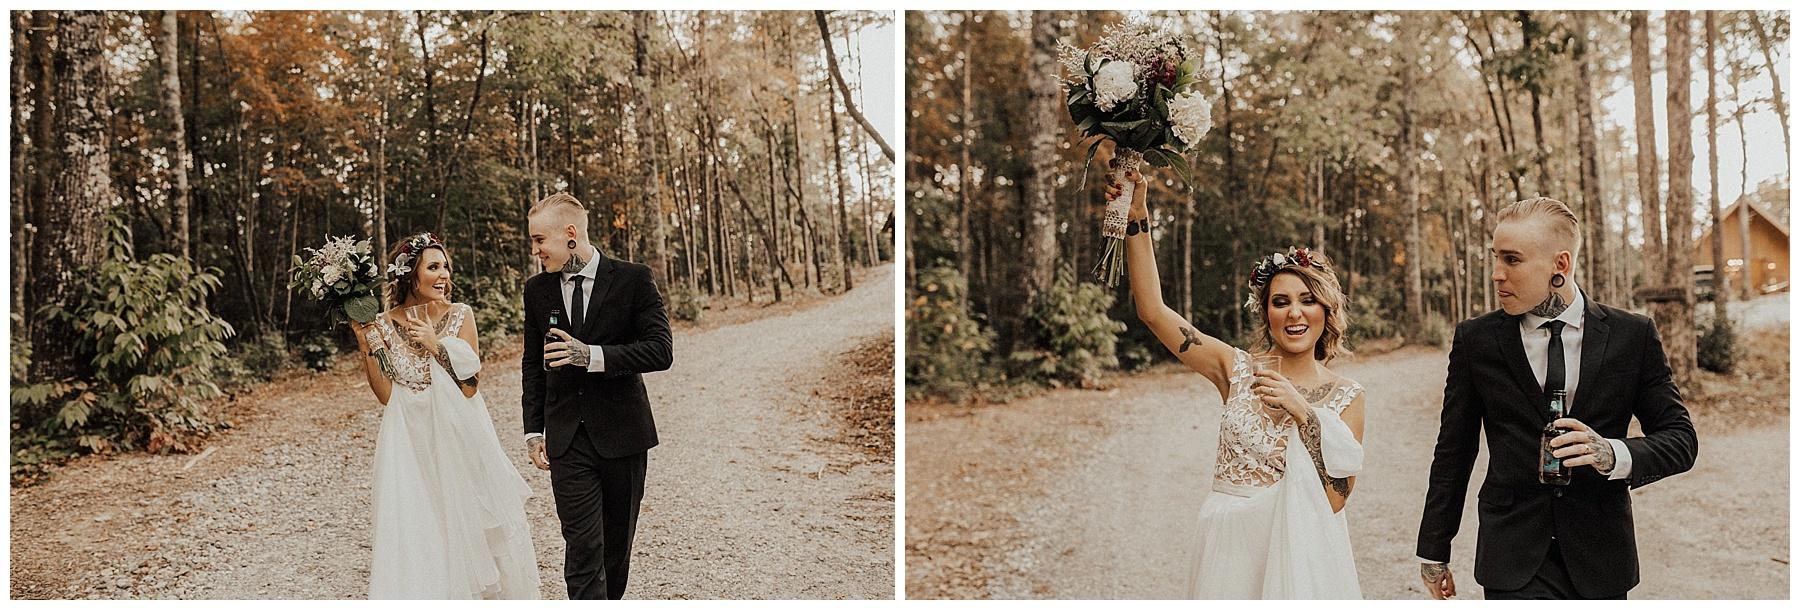 Georgia Wedding Tampa Wedding Photographer-114.jpg